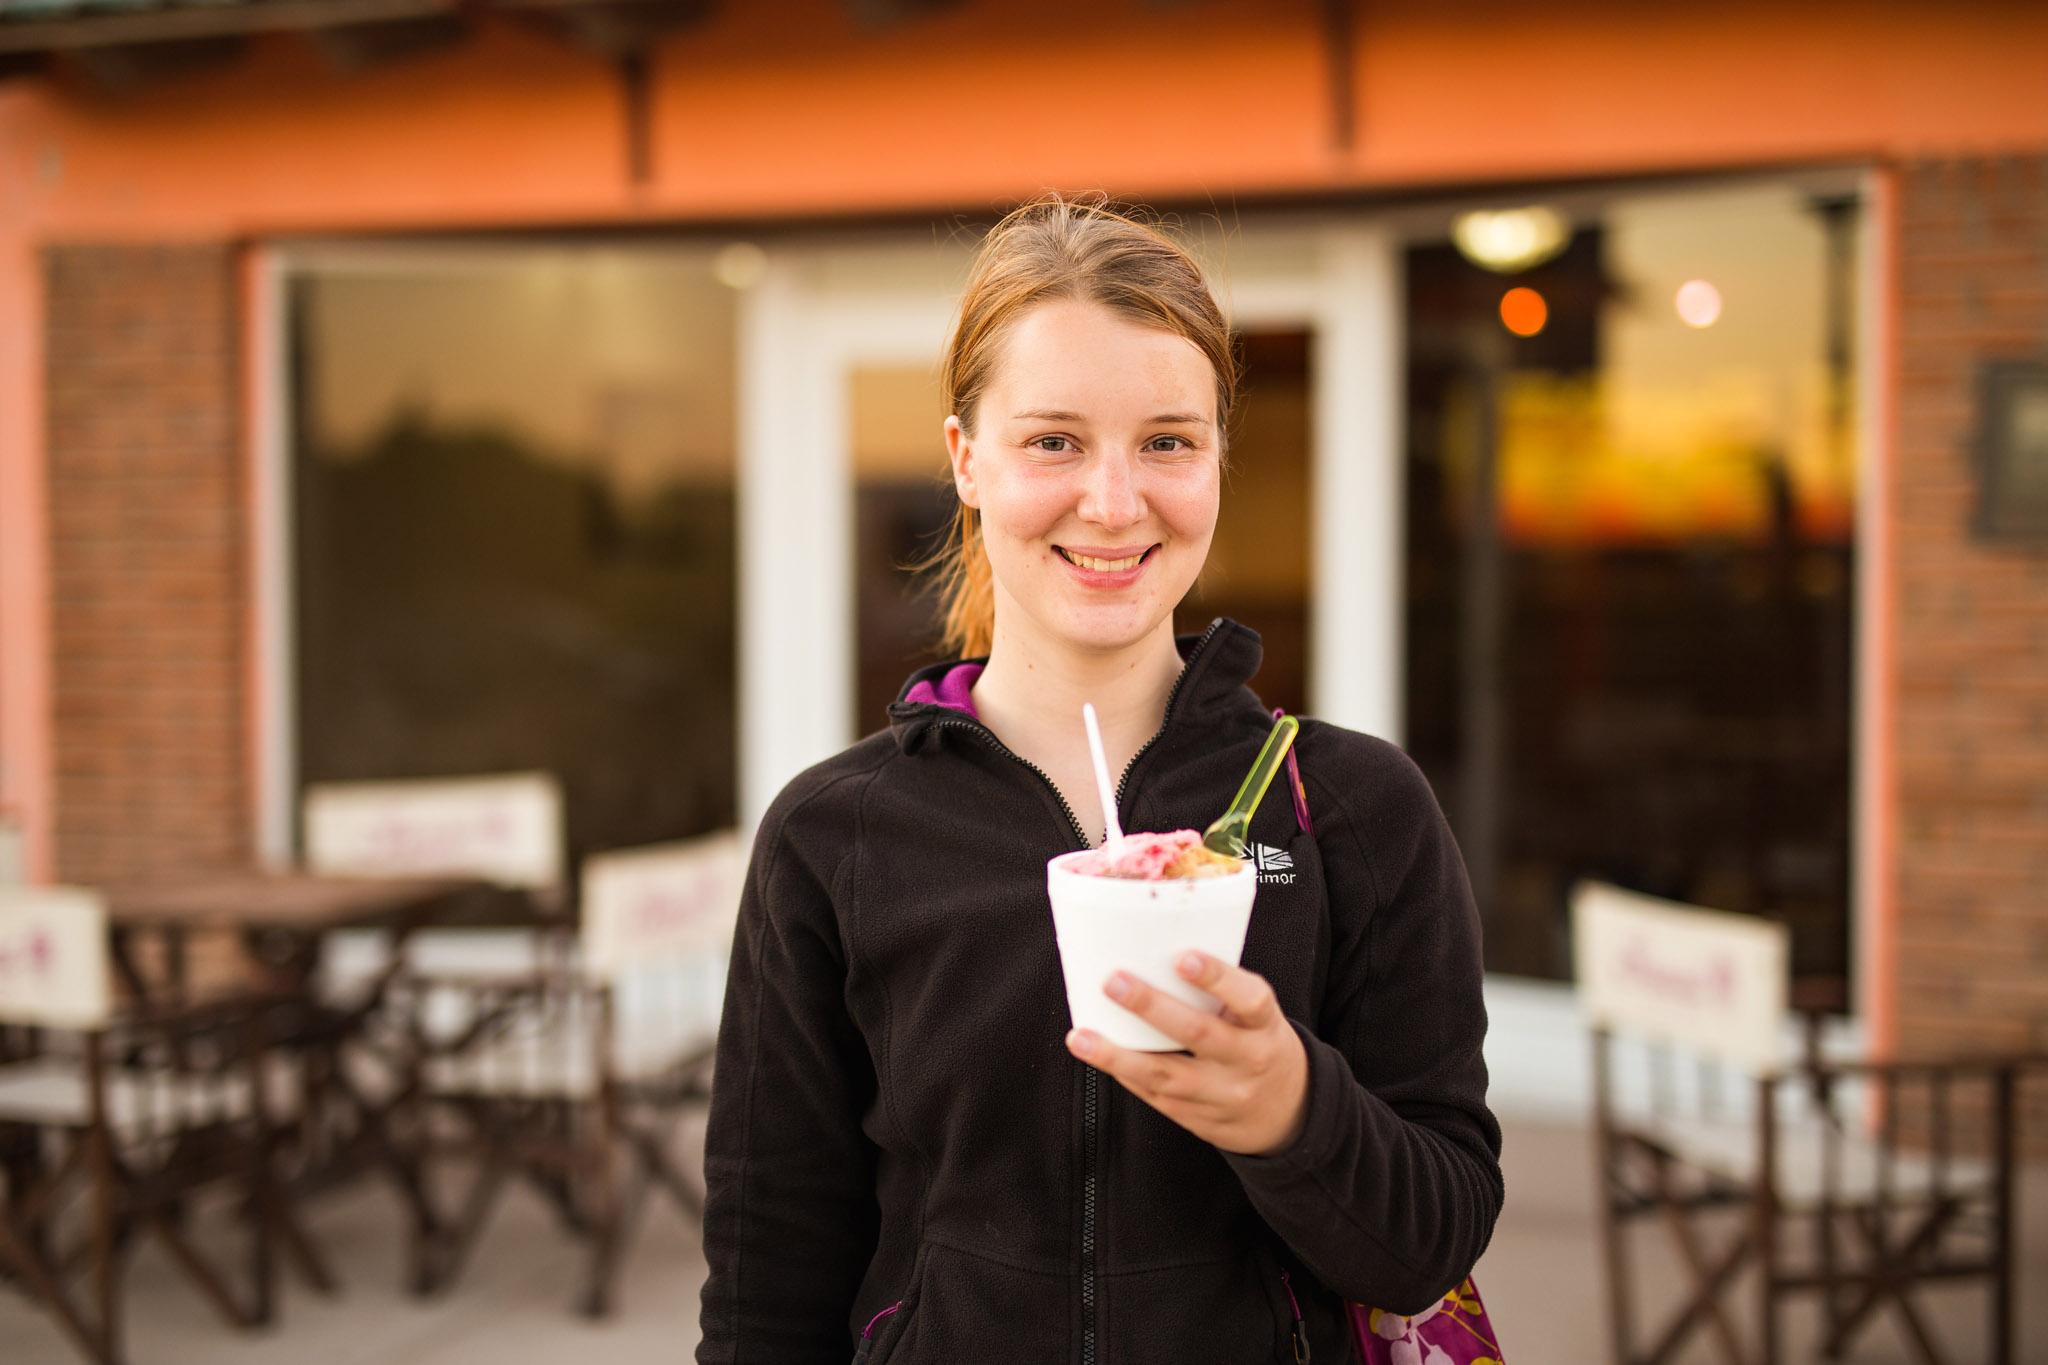 wedding-travellers-argentina-playas-doradas-happy-ice-cream-woman